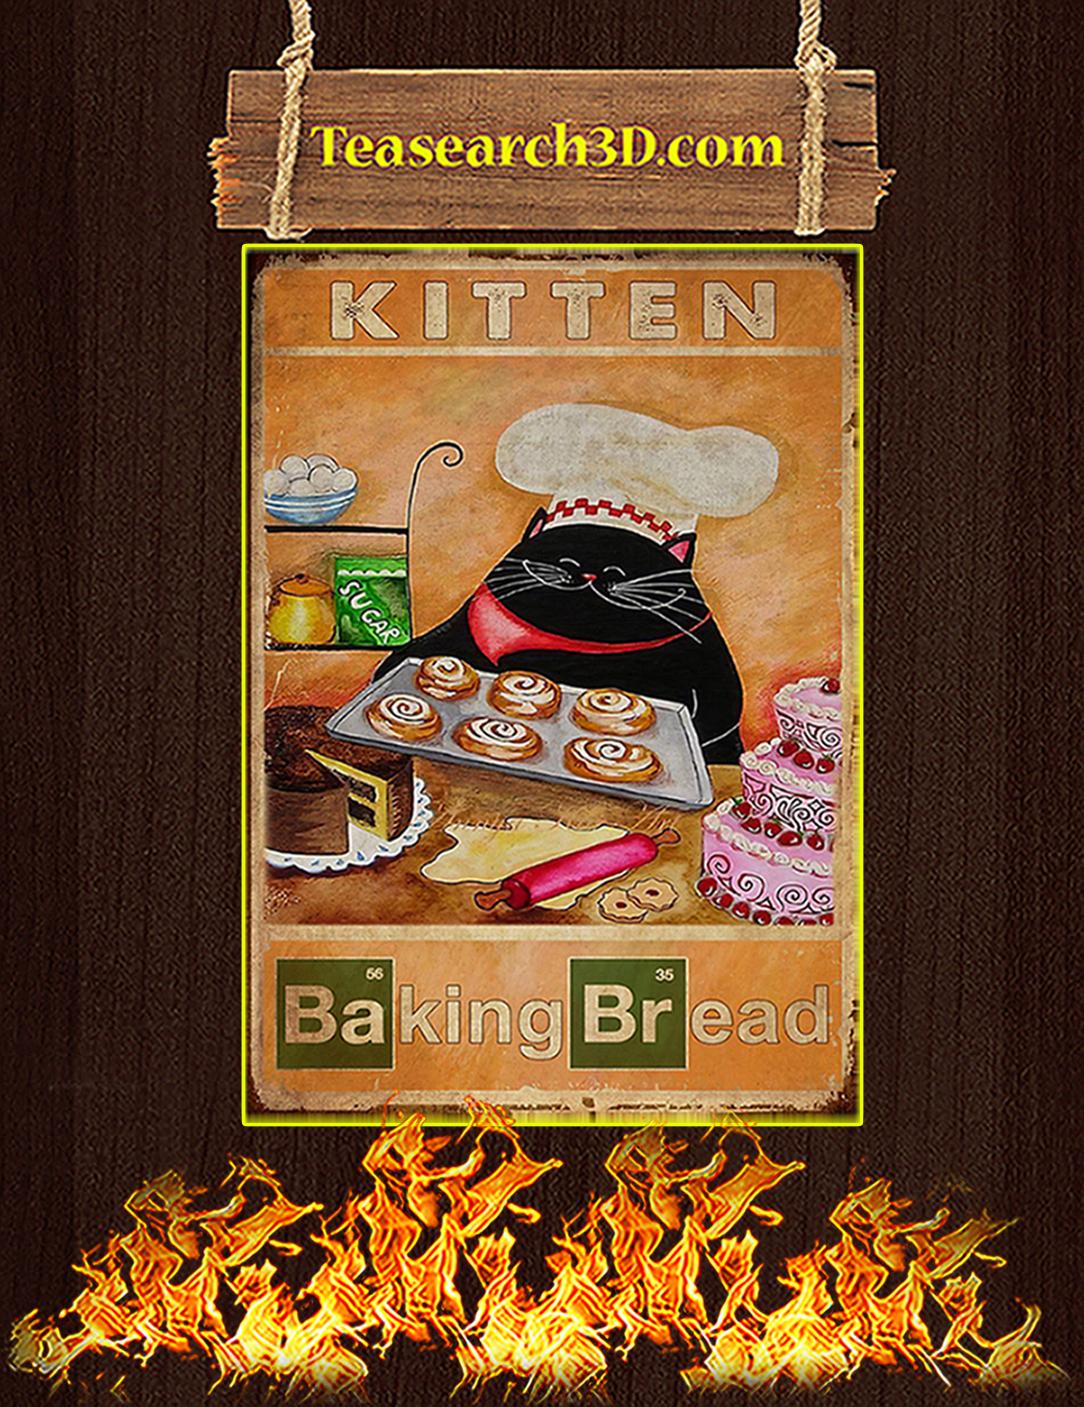 Kitten baking bread poster A2